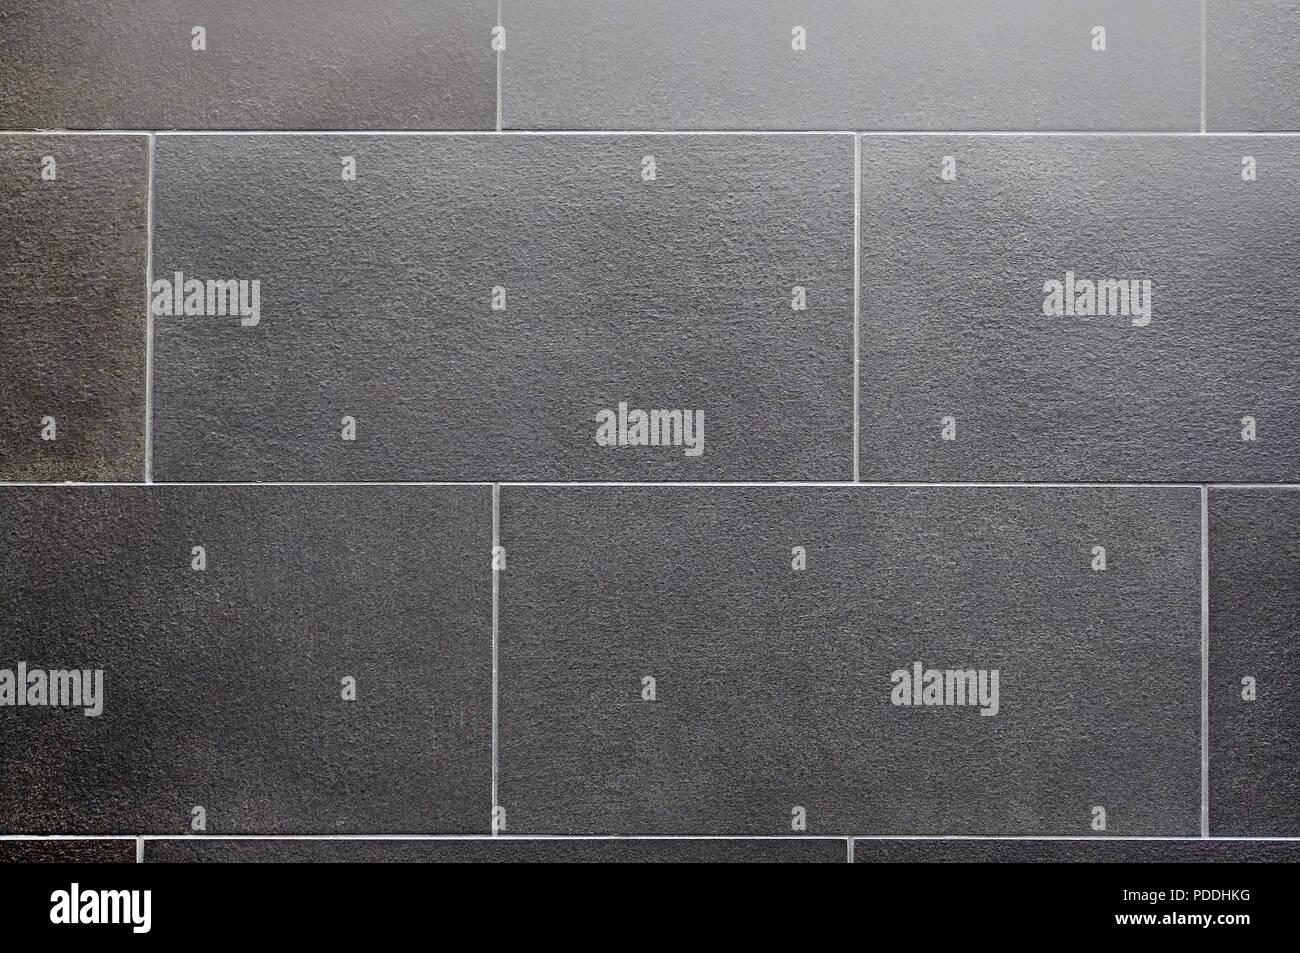 Ceramic Tile Seamless Texture Square Dark Gray Stock Photo